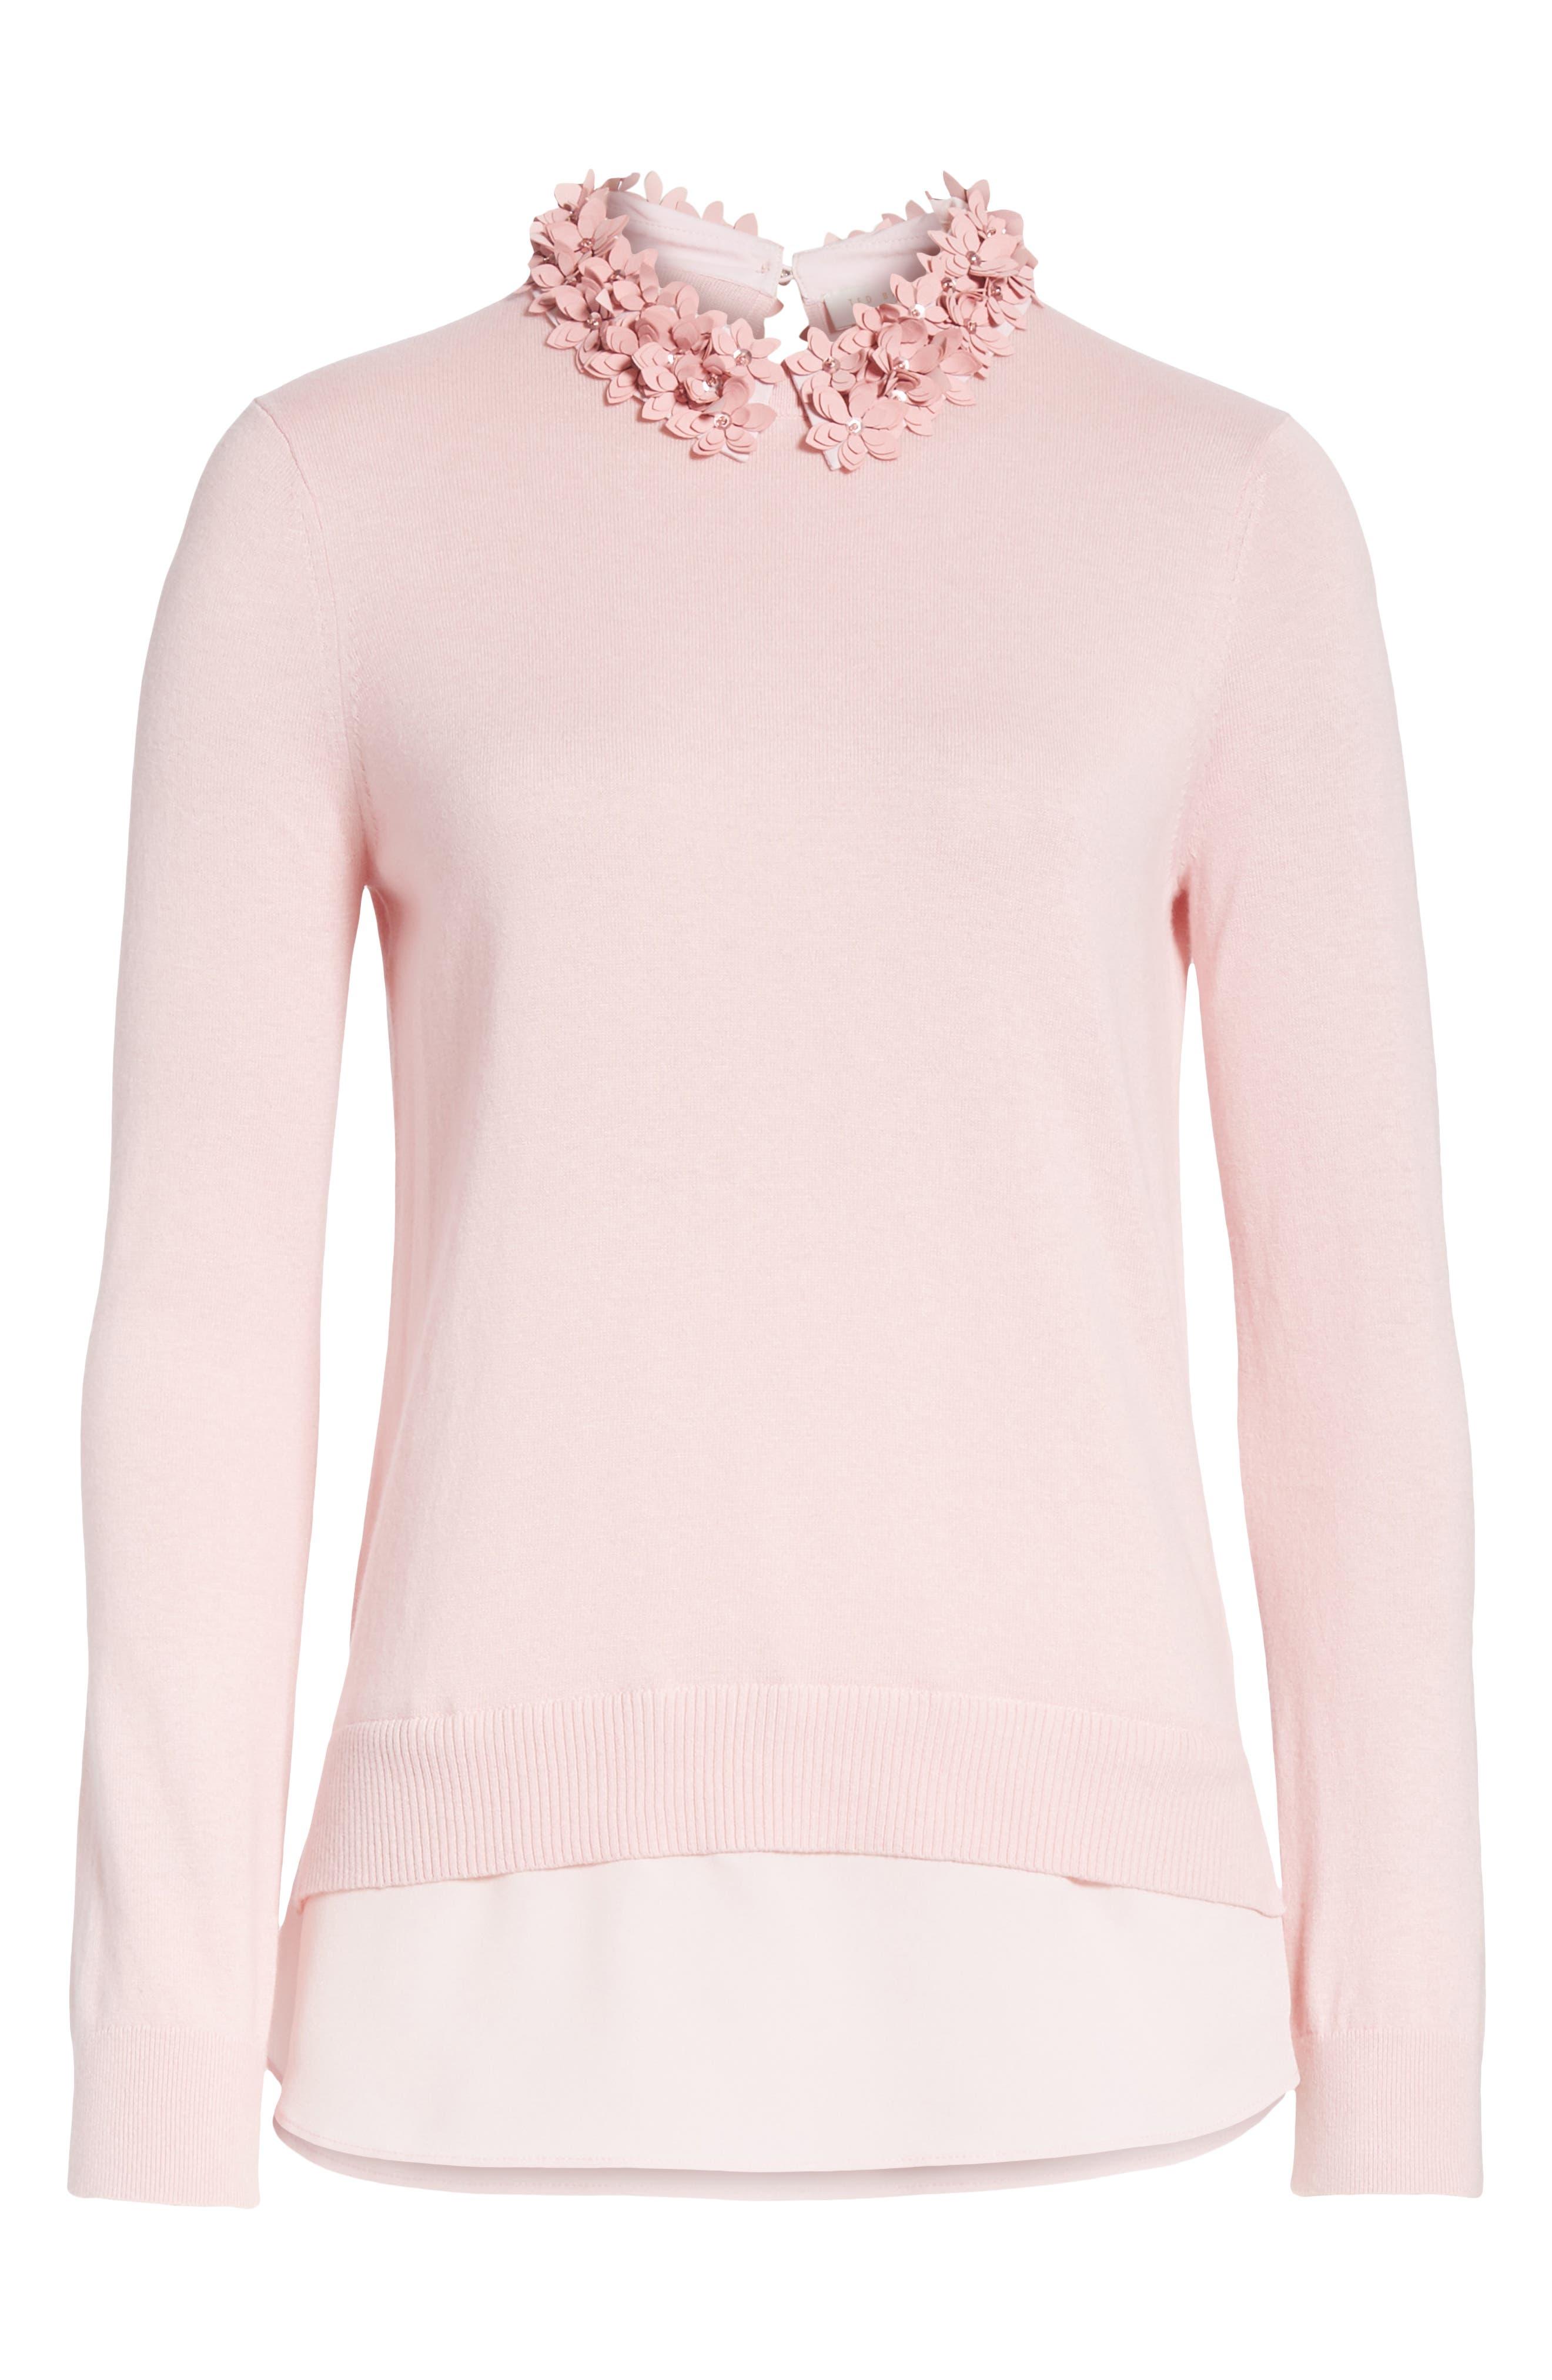 Nansea Floral Collar Tiered Hem Sweater,                             Alternate thumbnail 6, color,                             PINK